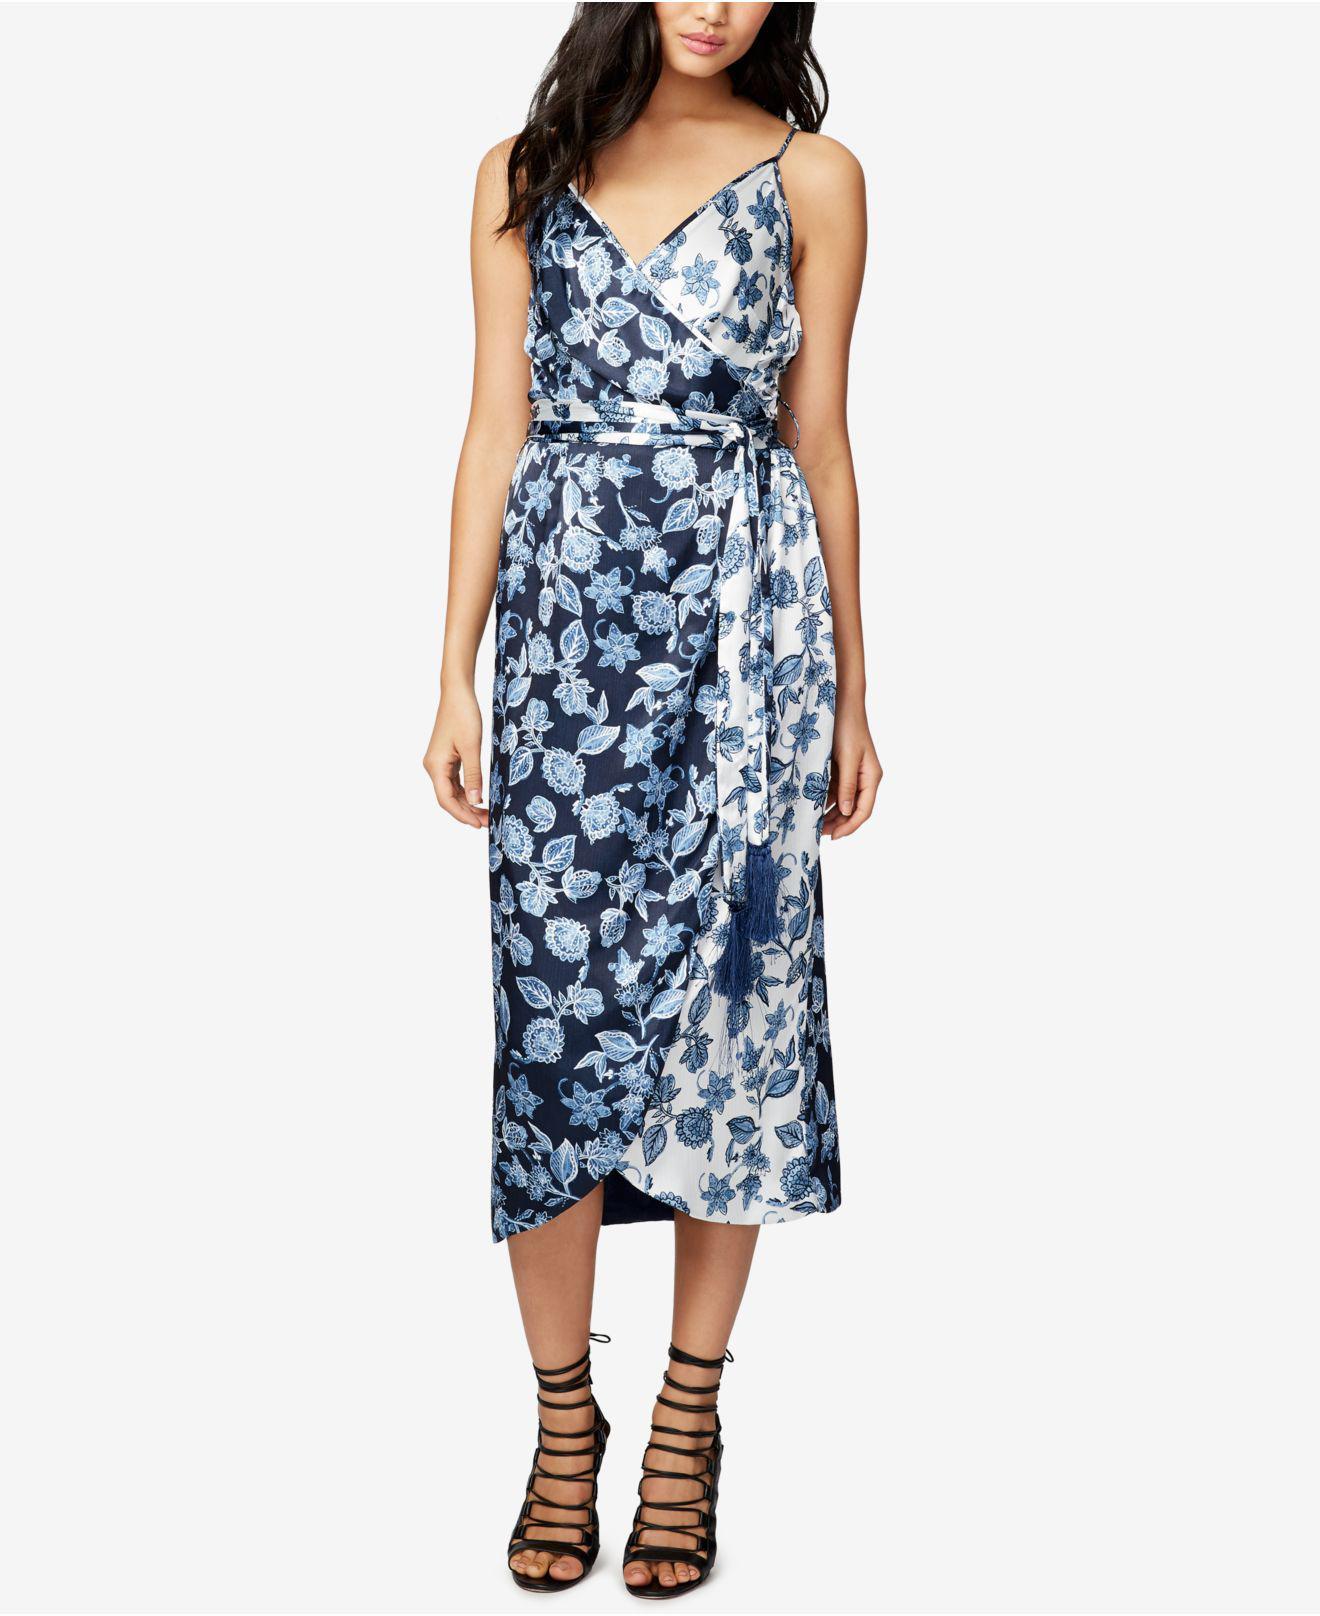 9473c2b8fb61b Lyst - RACHEL Rachel Roy Floral-print Wrap Slip Midi Dress in Blue